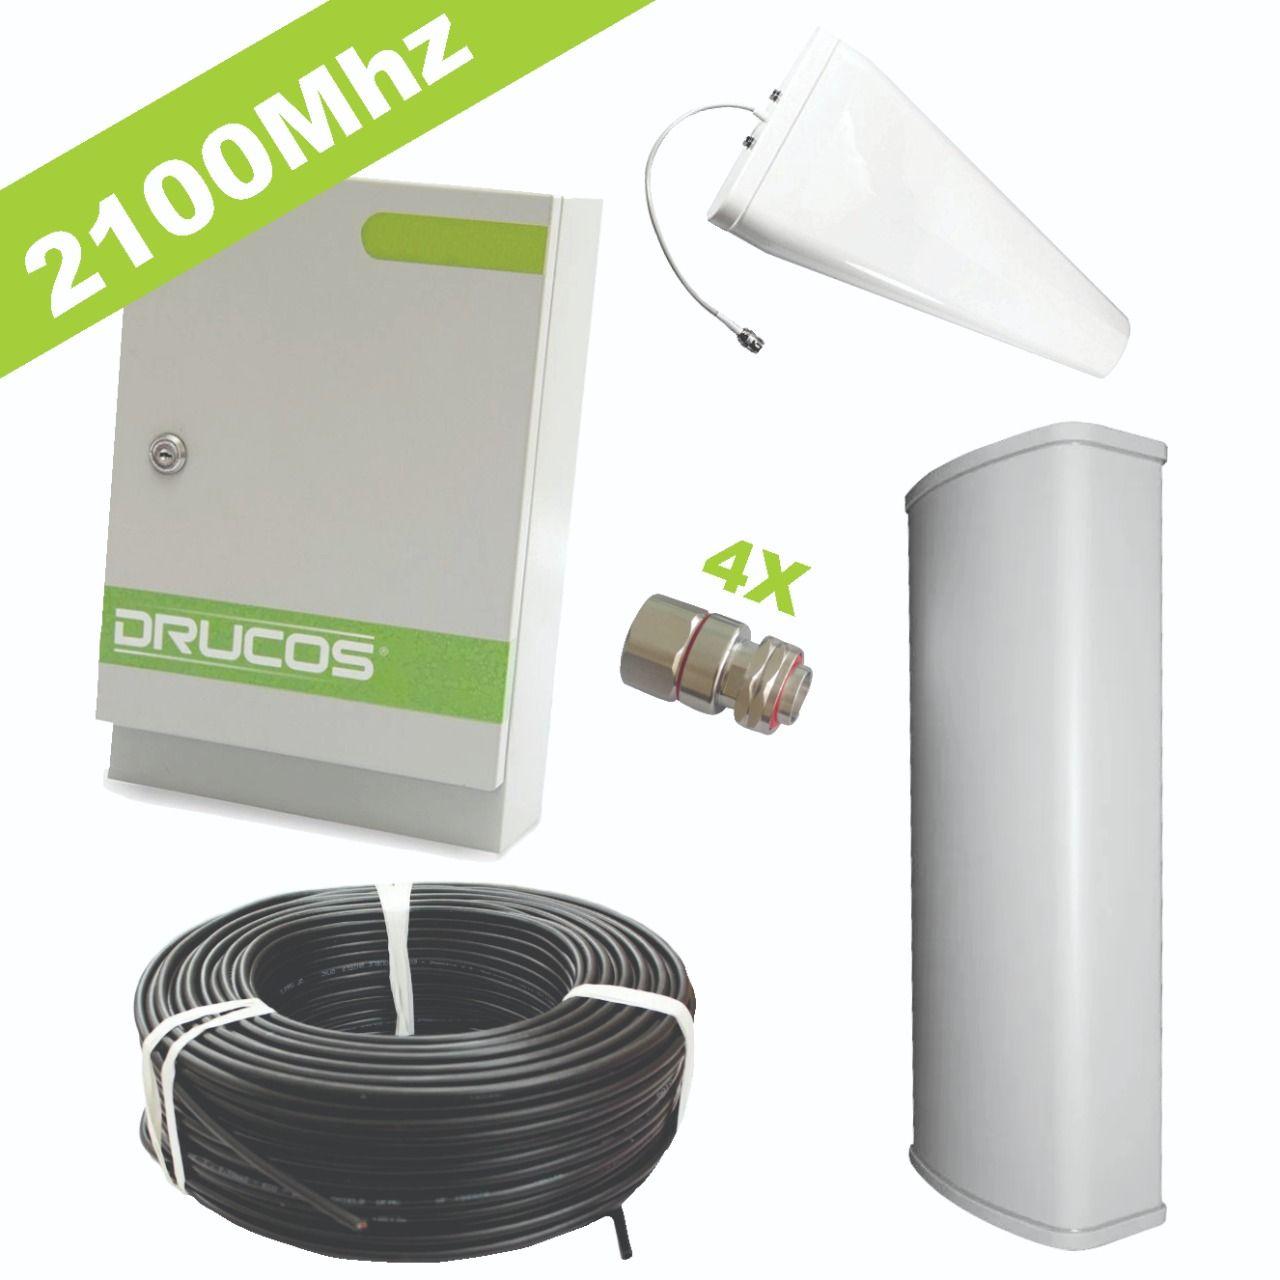 Kit de Instalação 2100Mhz 2Watts 85dB (Repetidor + Antenas + Cabo + Conectores)